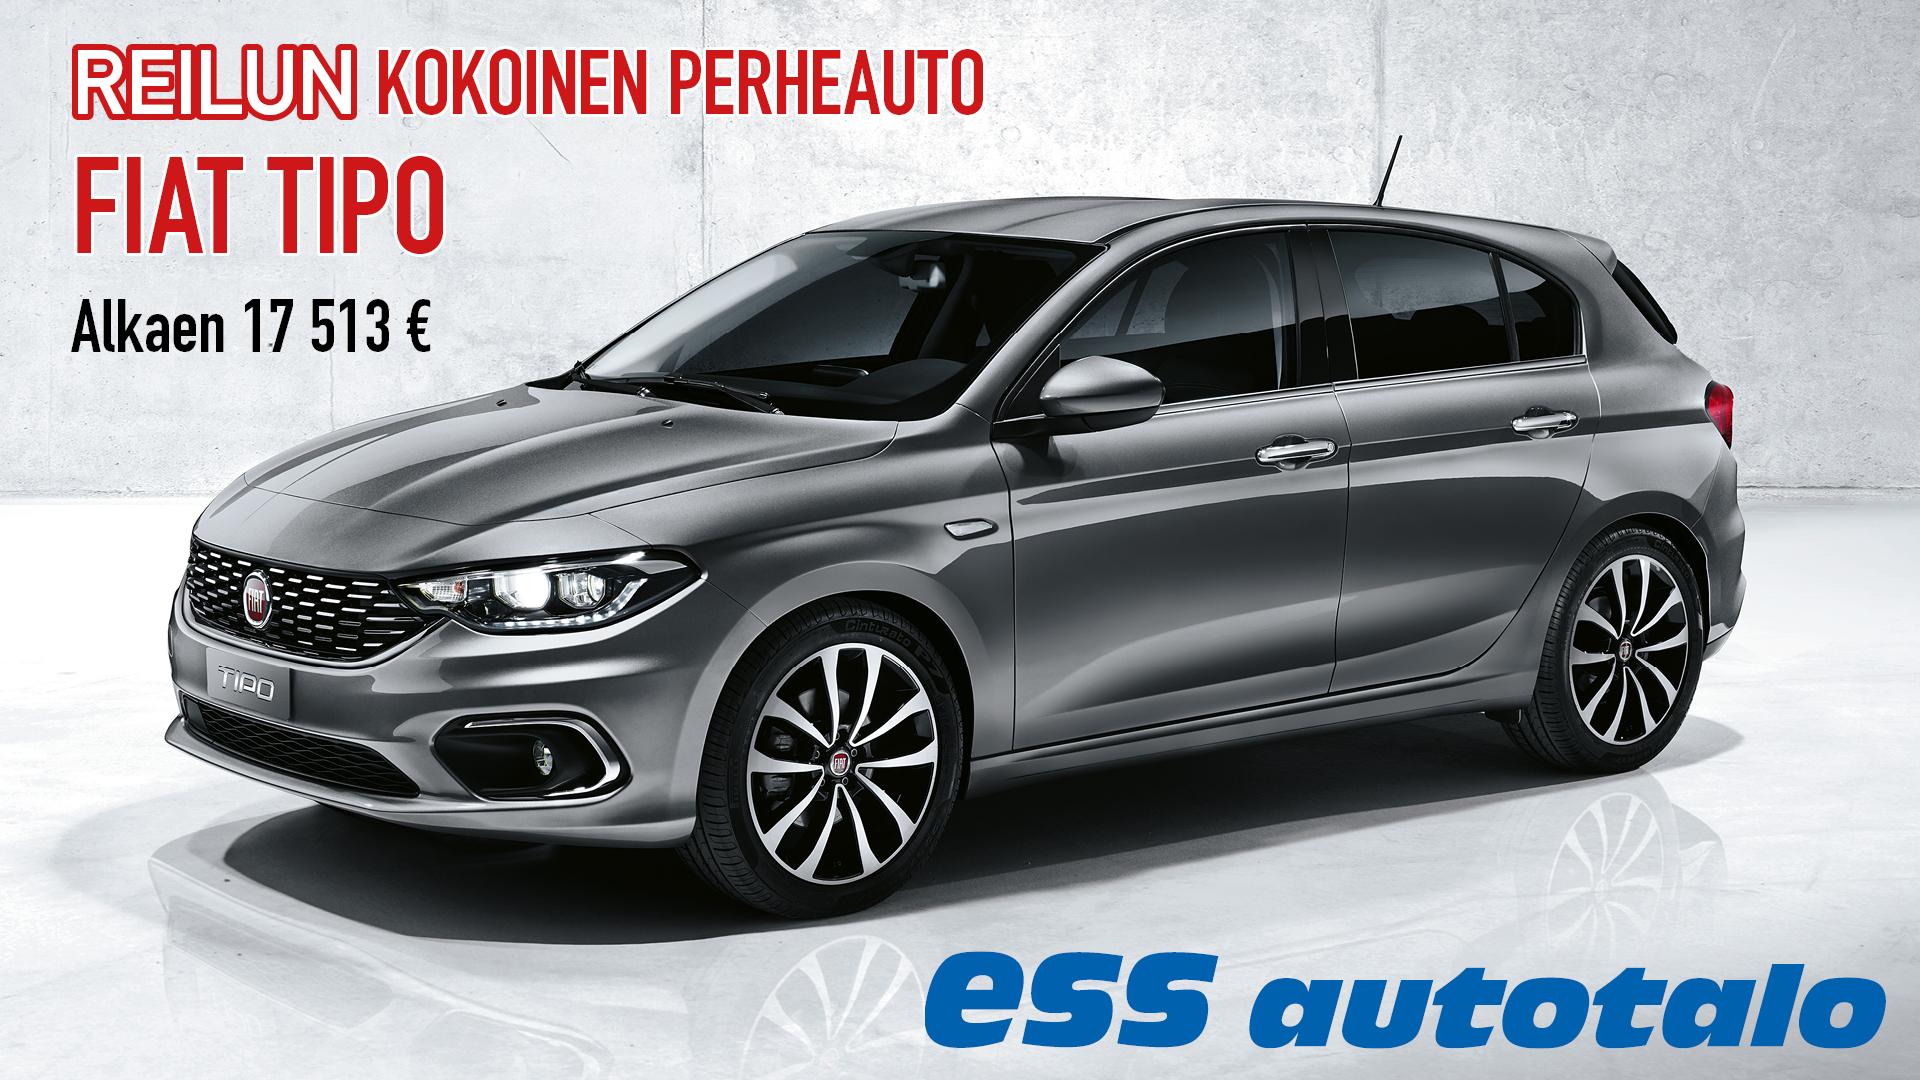 ESS Autotalo